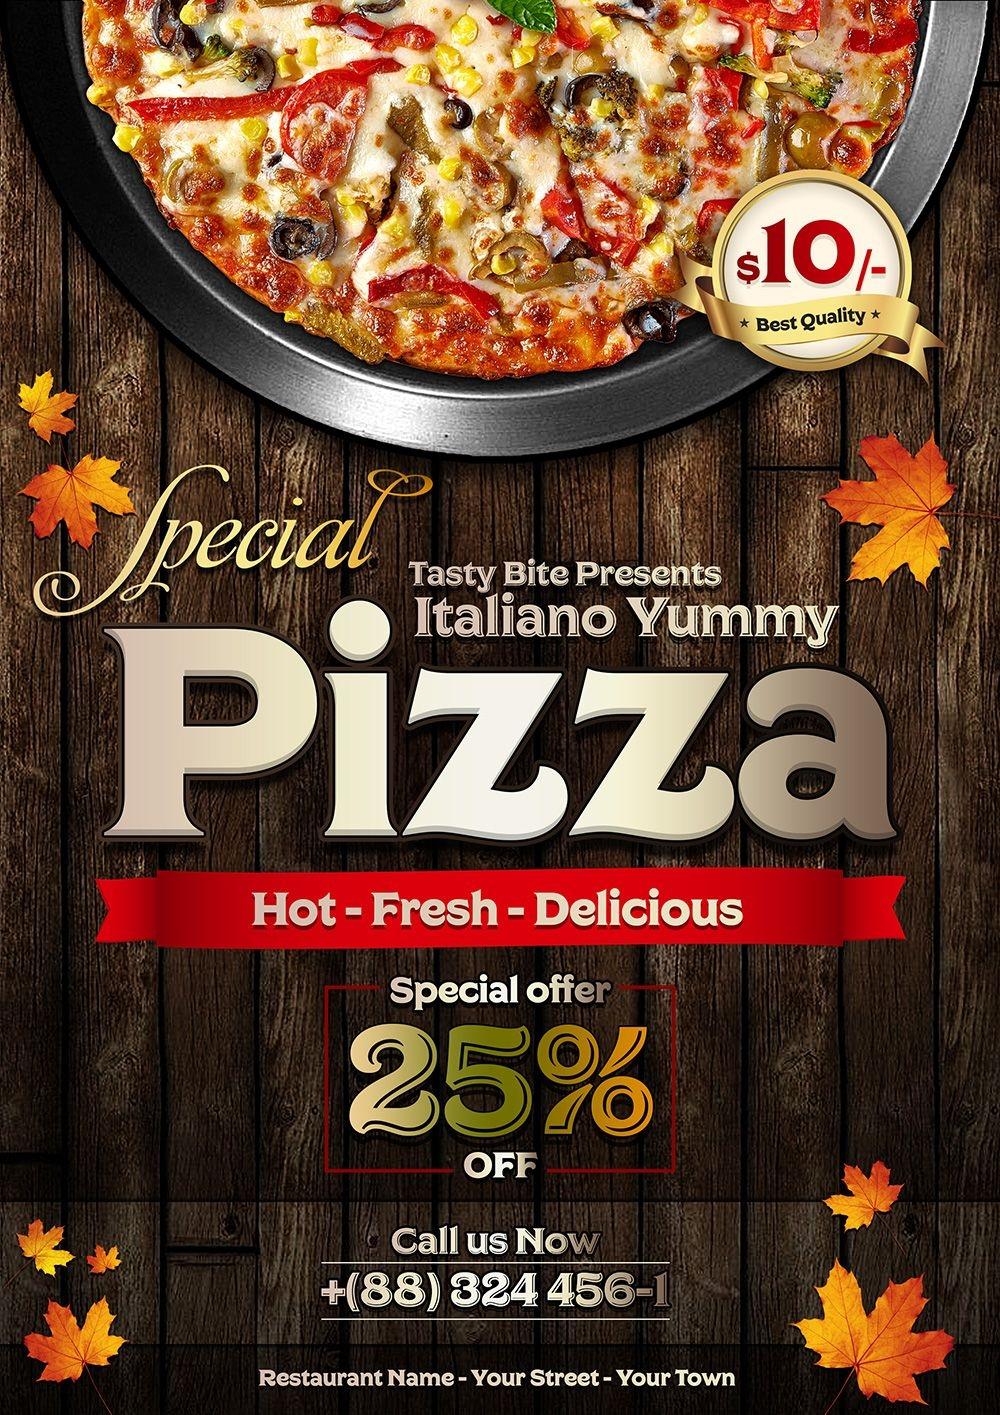 Vintage Pizza Flyer Template Design Psd 1 Pizatemplet Pizza